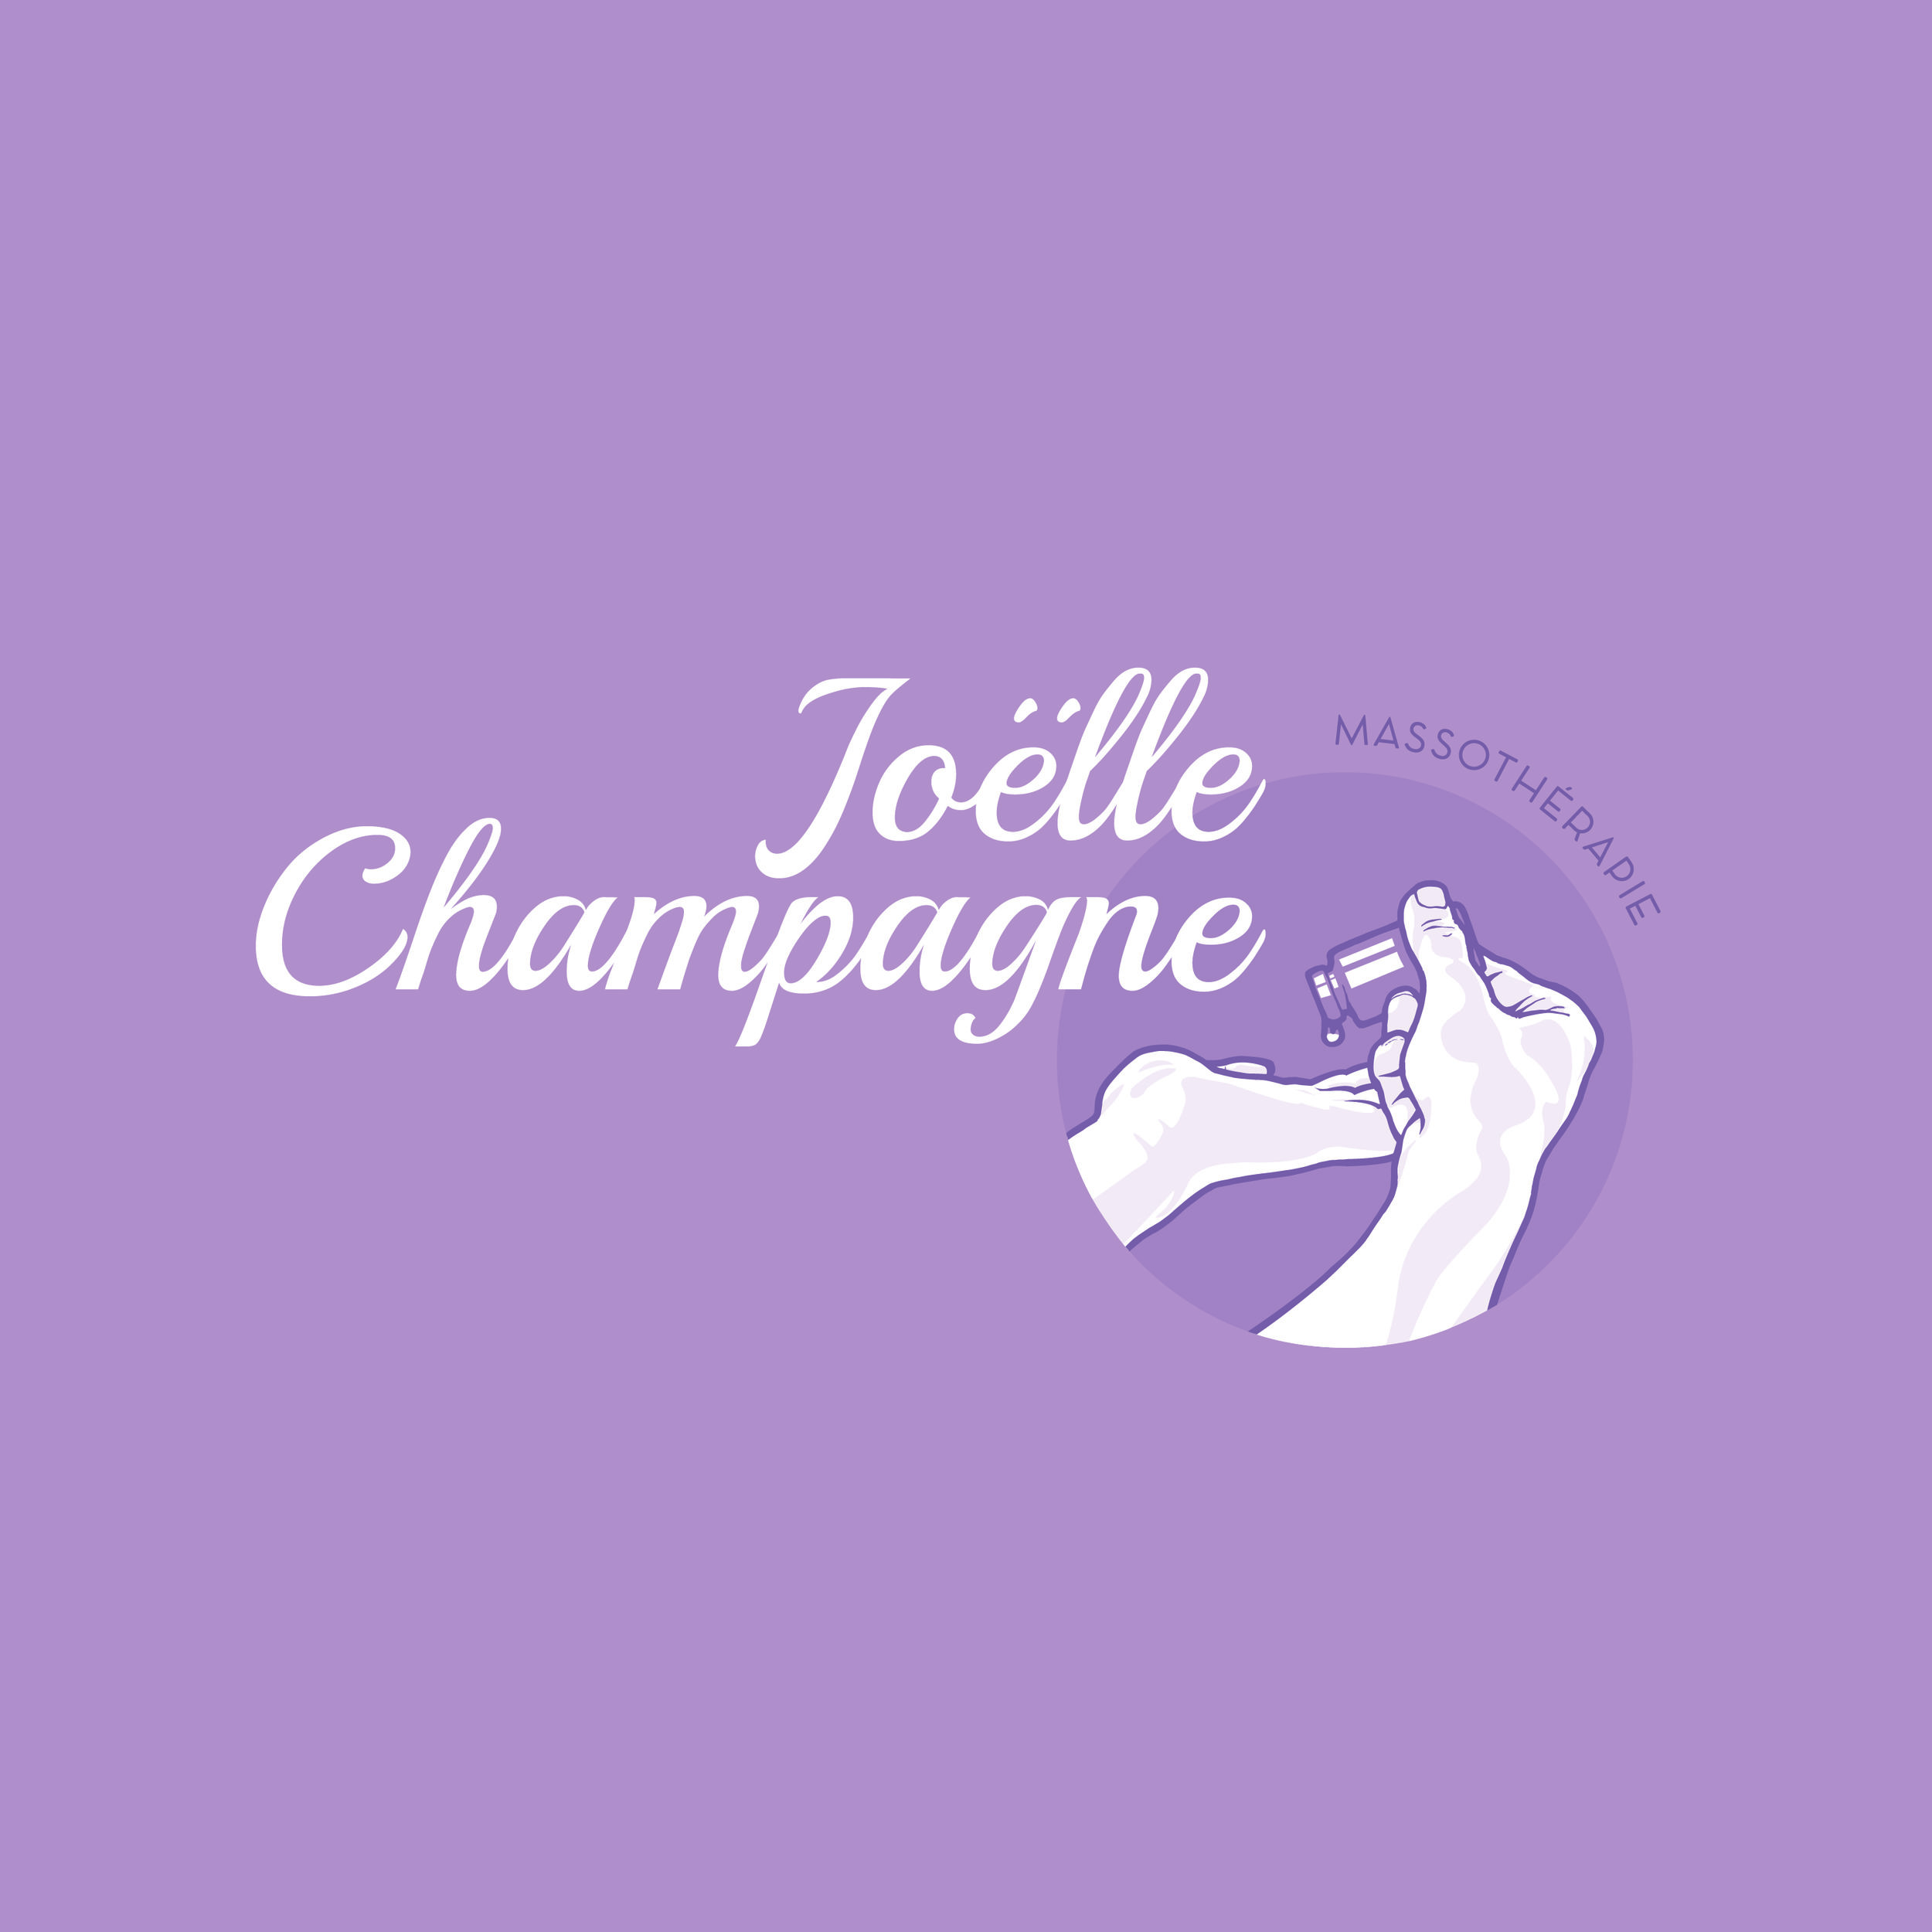 2018-JoelleChampagneMasso-Couleur.jpg